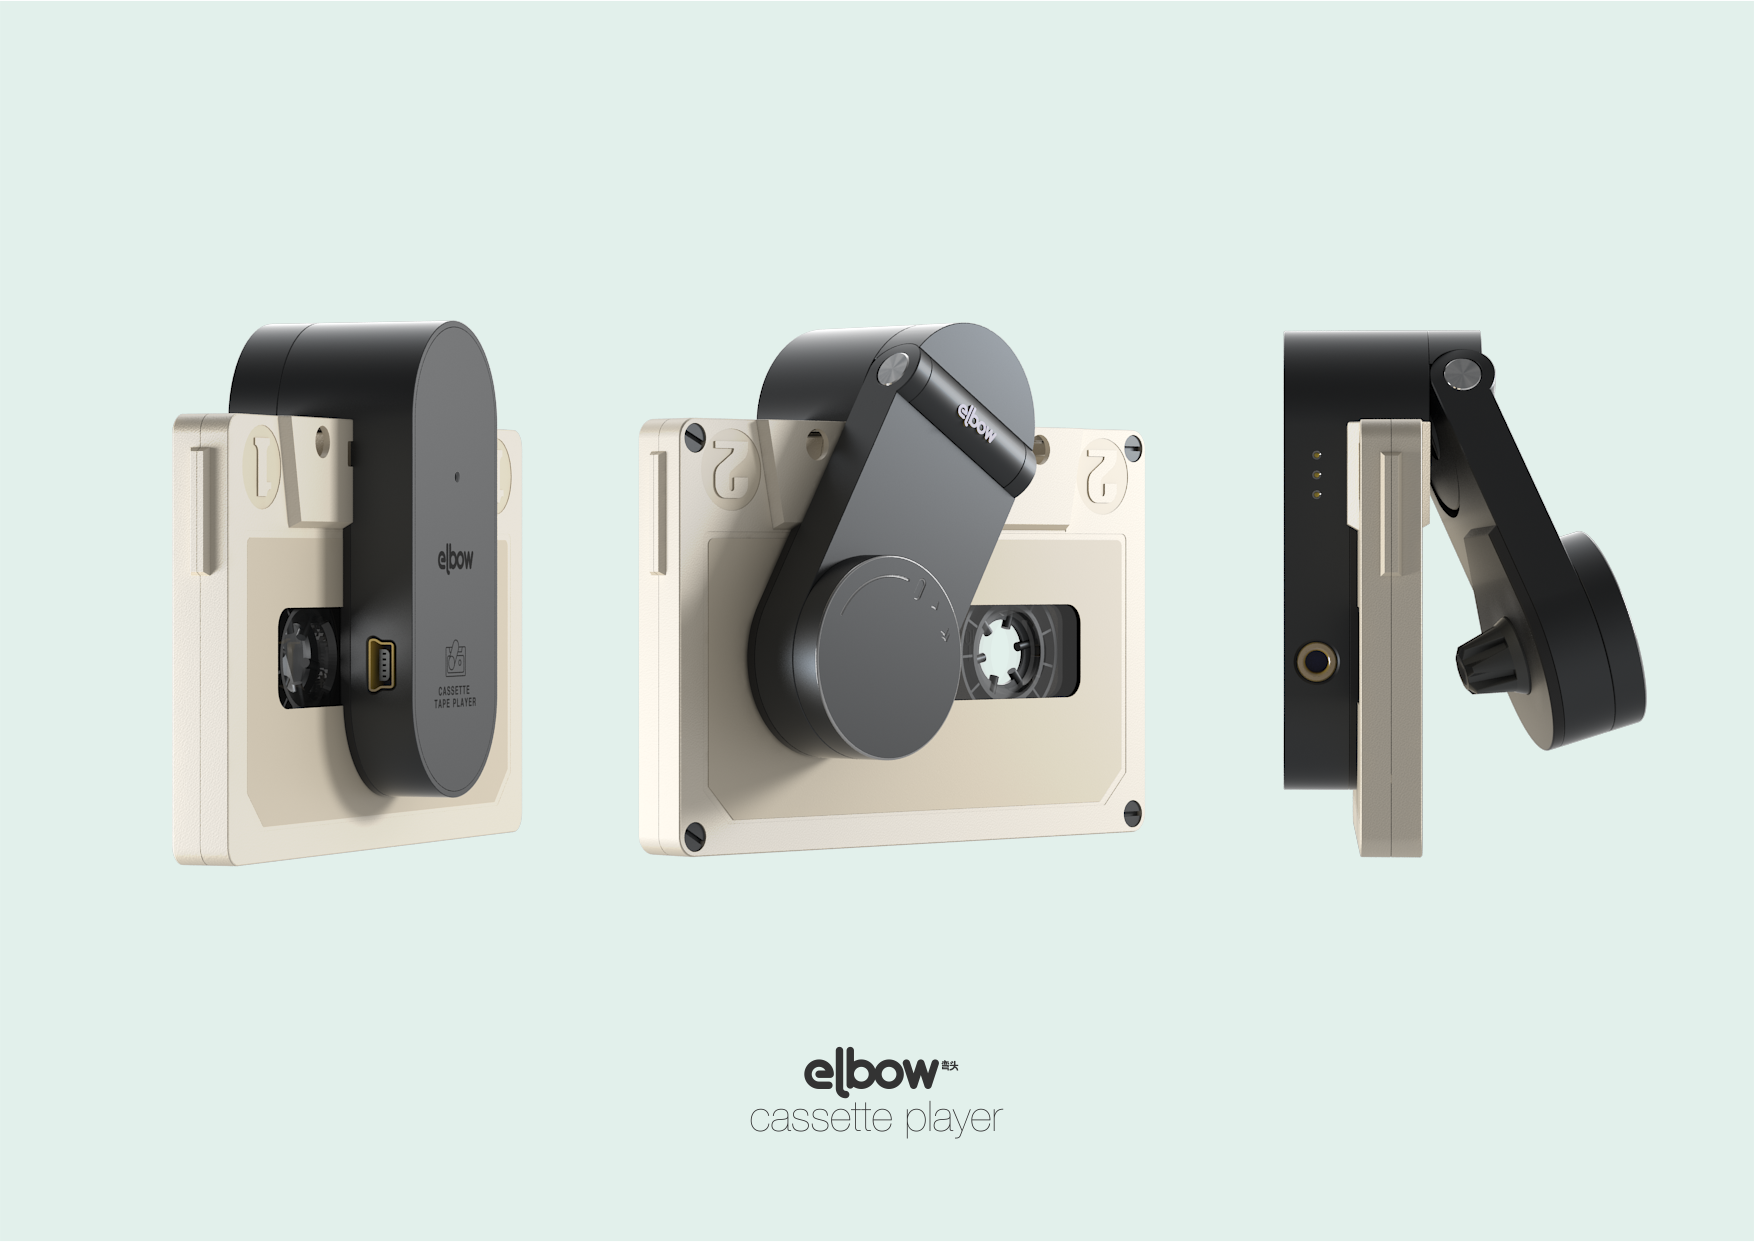 ELBOW – cassette player Elbow4